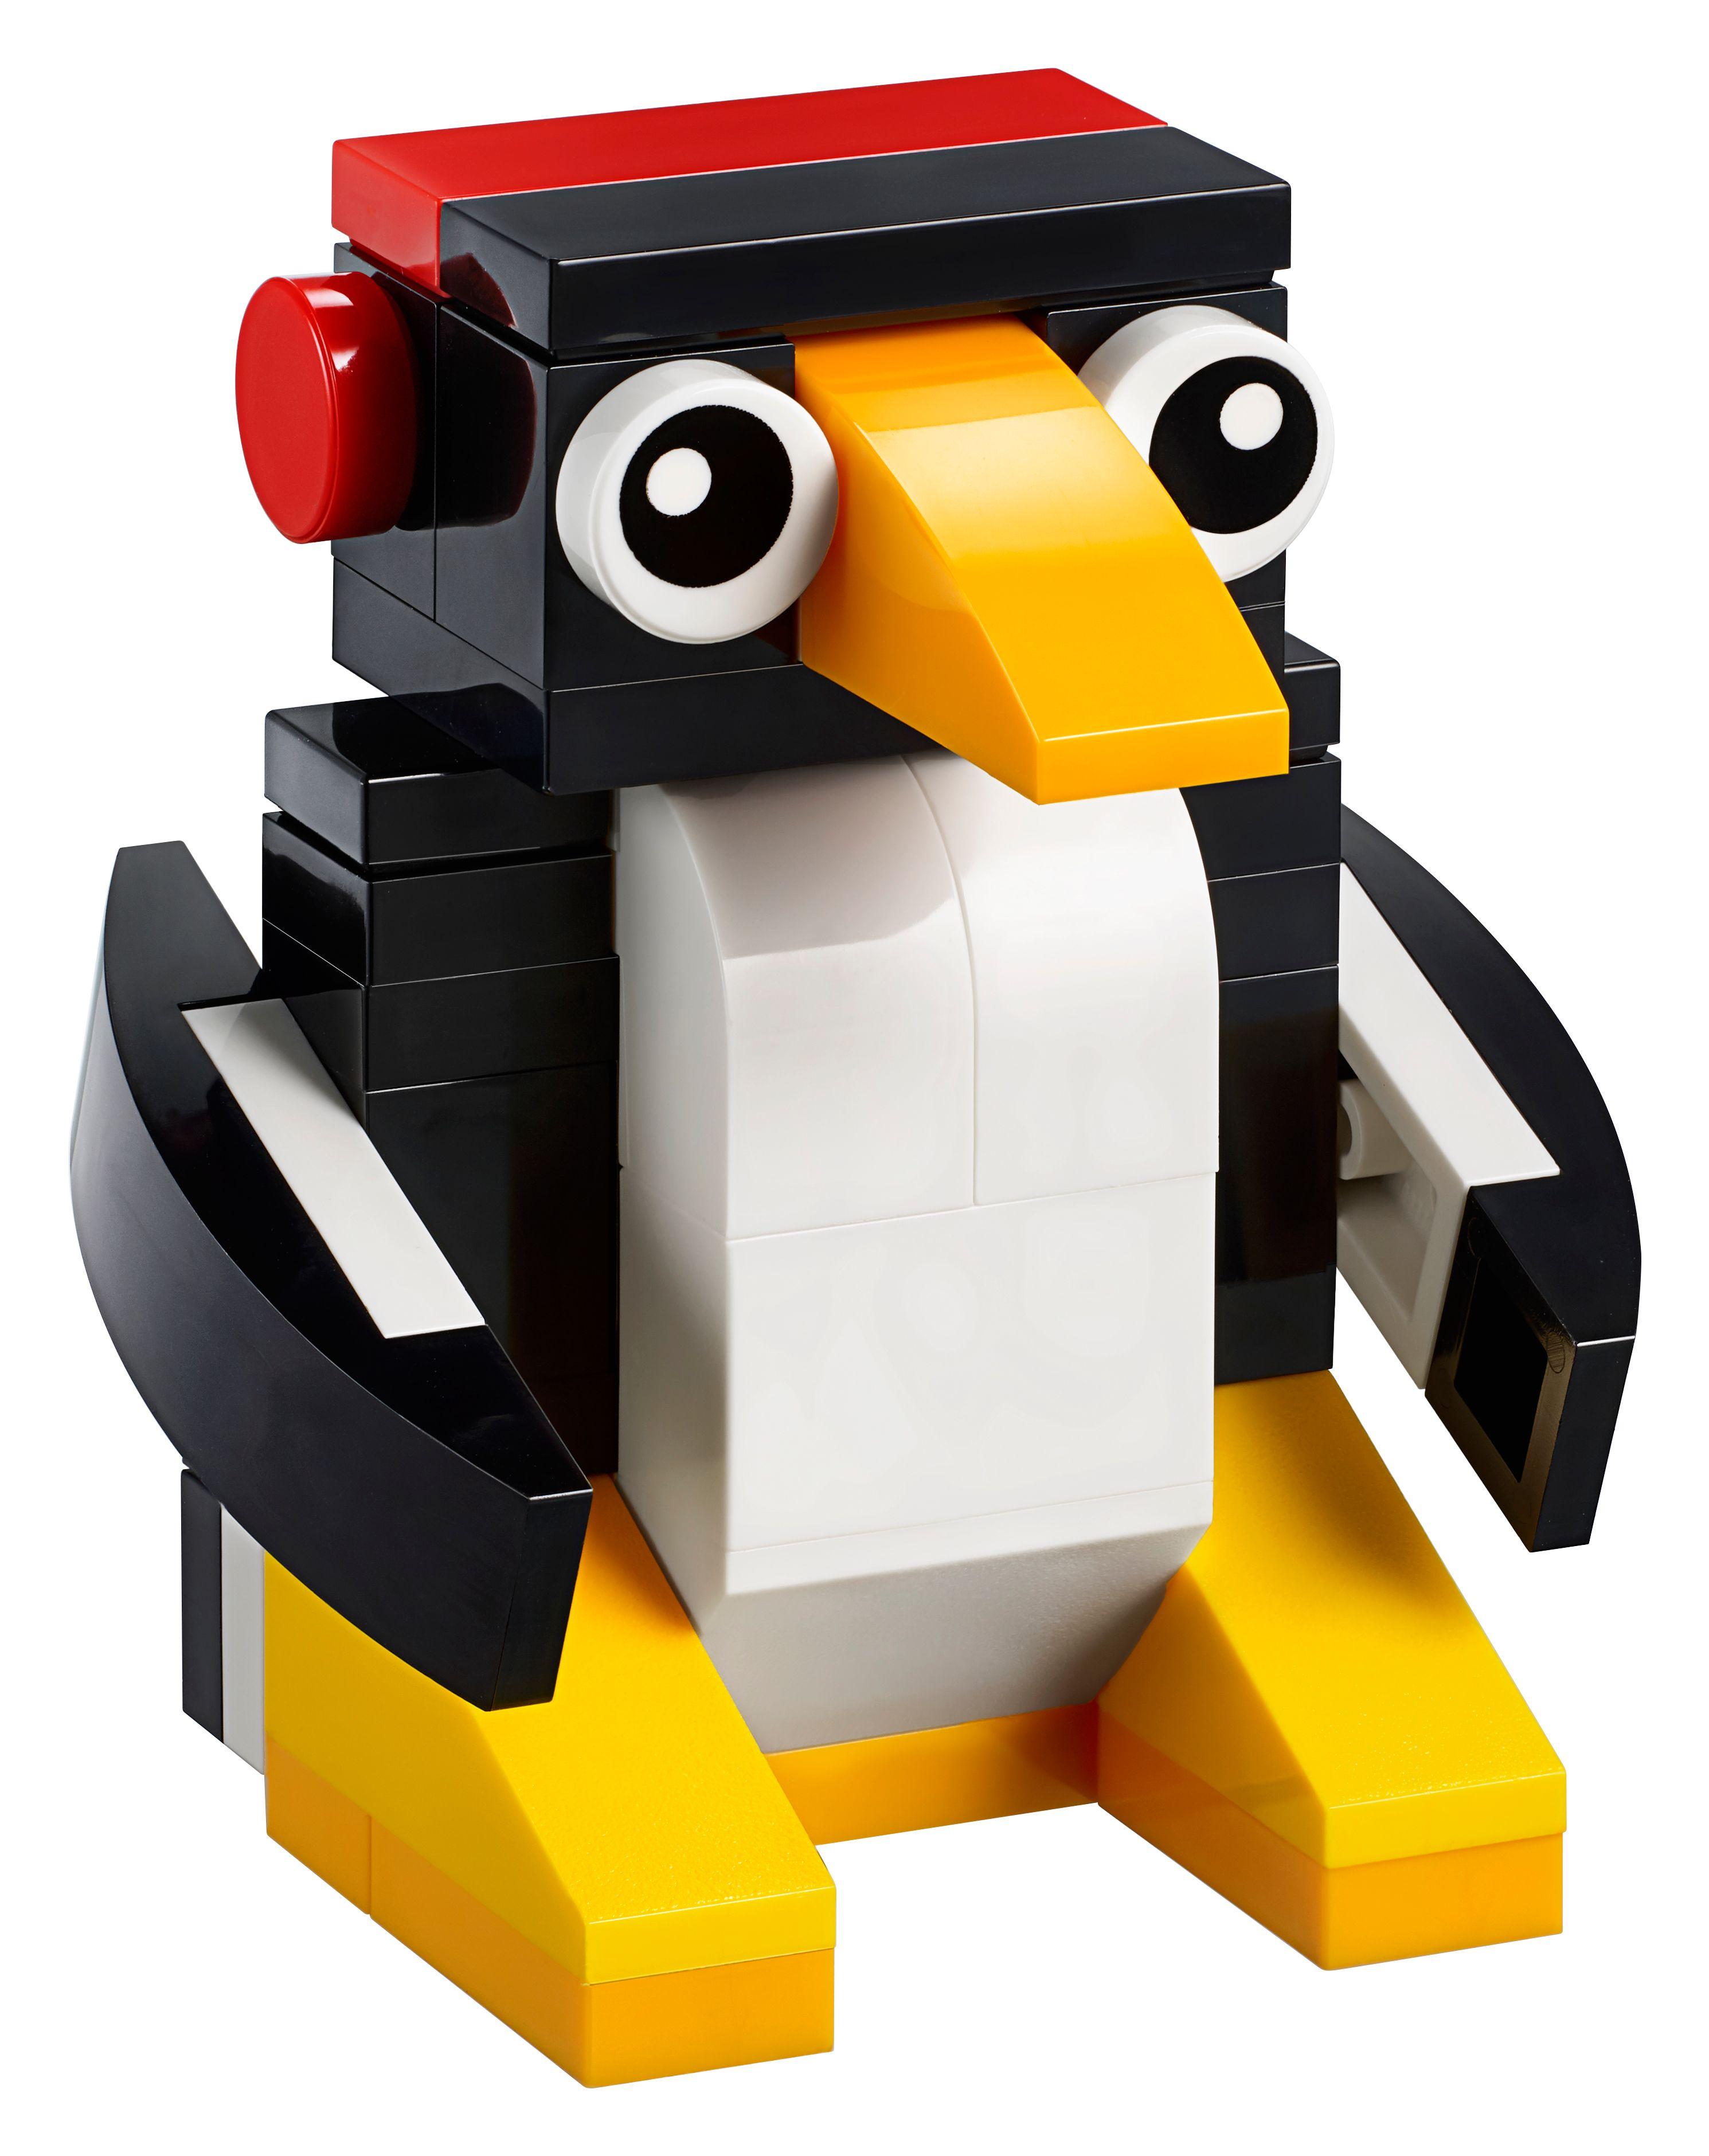 Gratis Lego Mini Modell Bautag - Pinguin